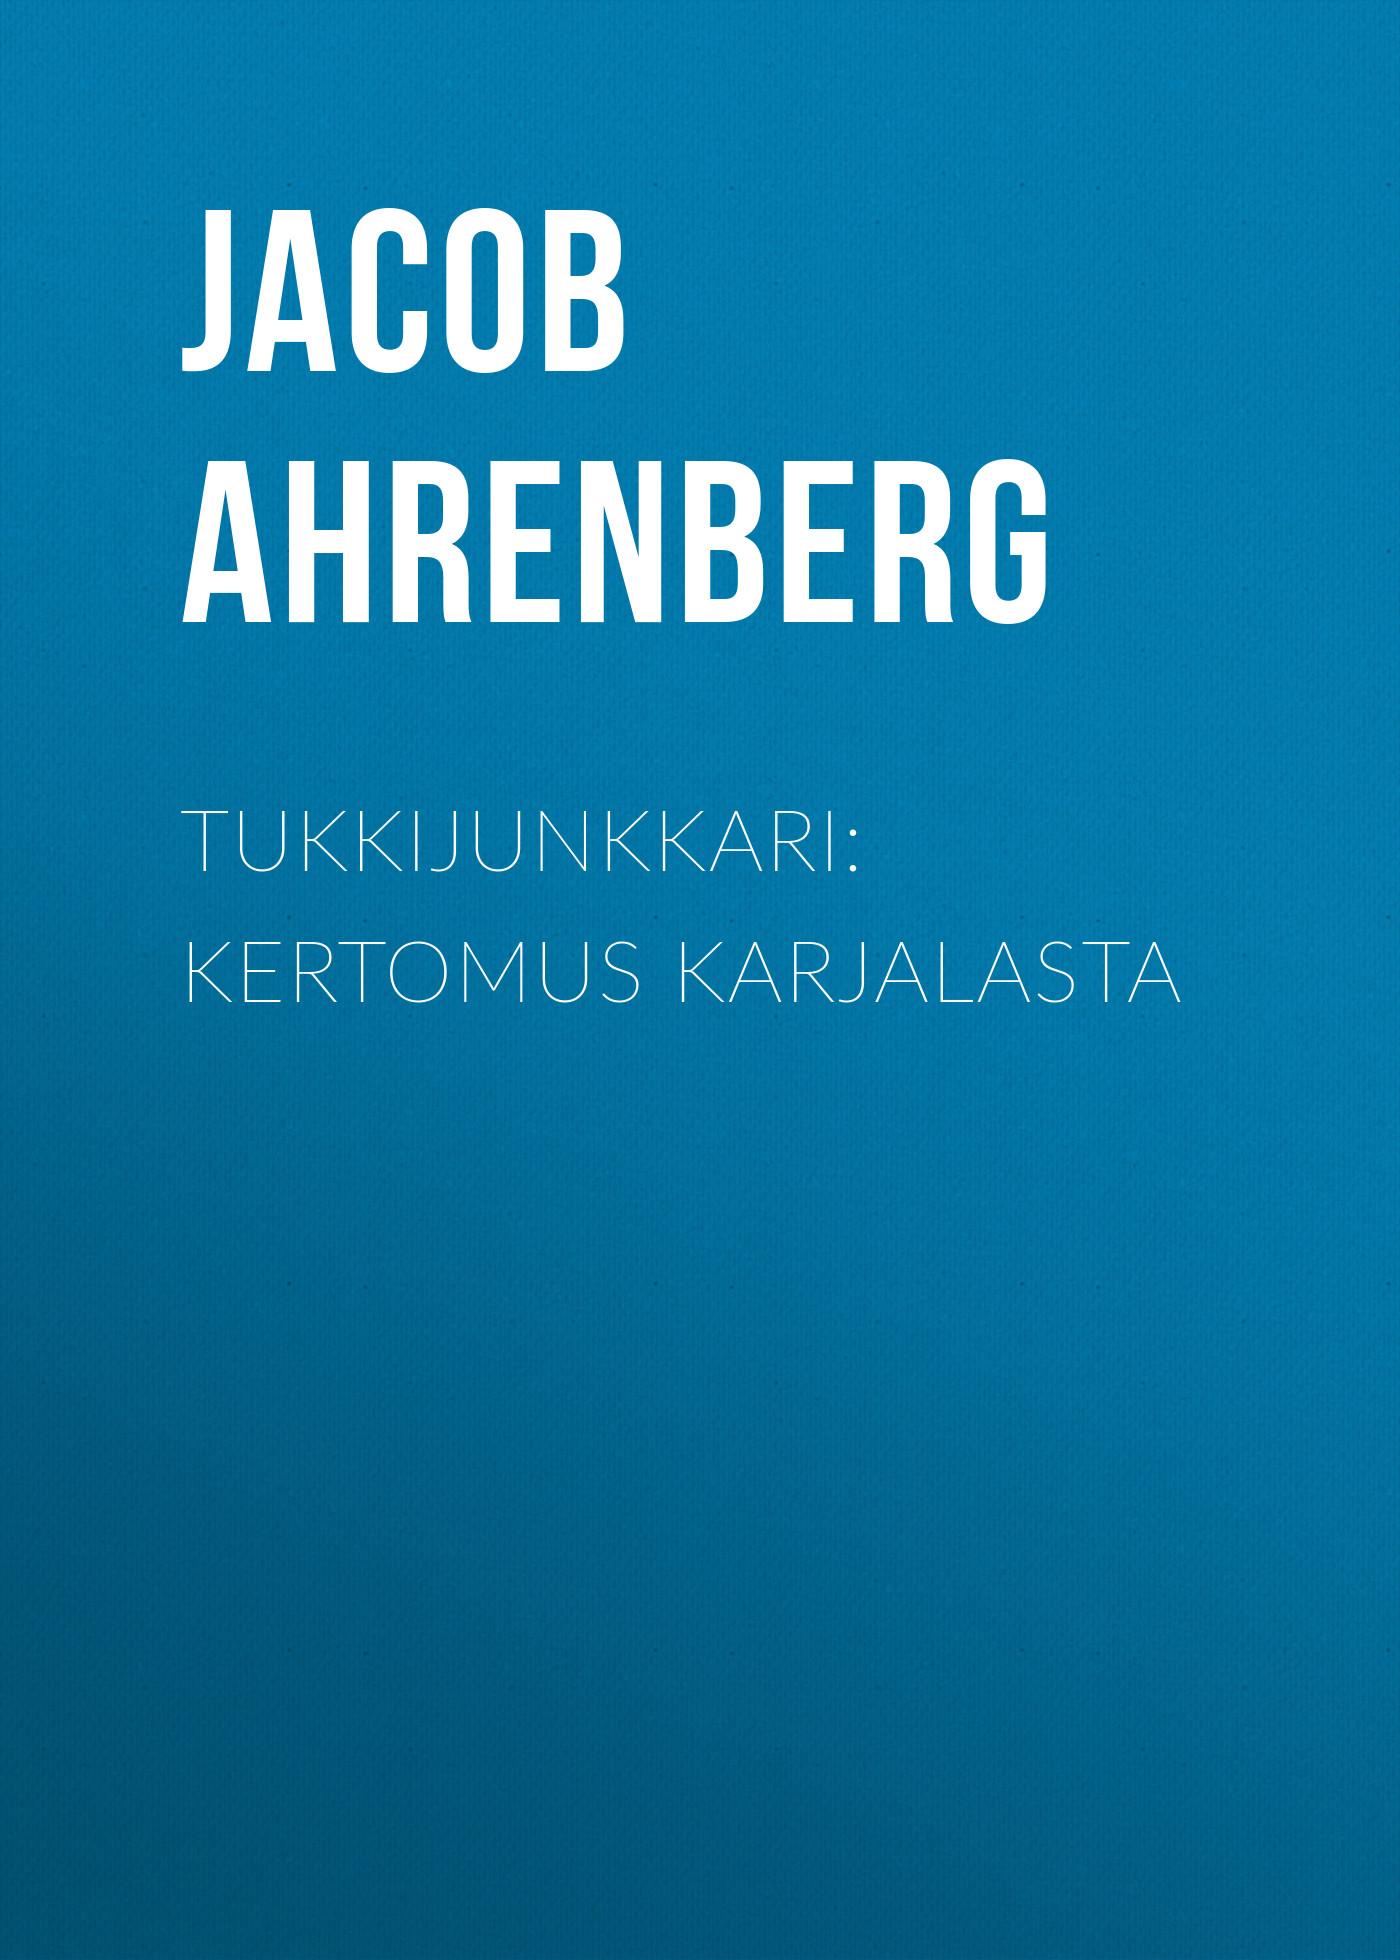 Jacob Ahrenberg Tukkijunkkari: Kertomus Karjalasta jacob ahrenberg hihhuleita kuvauksia ita suomesta finnish edition